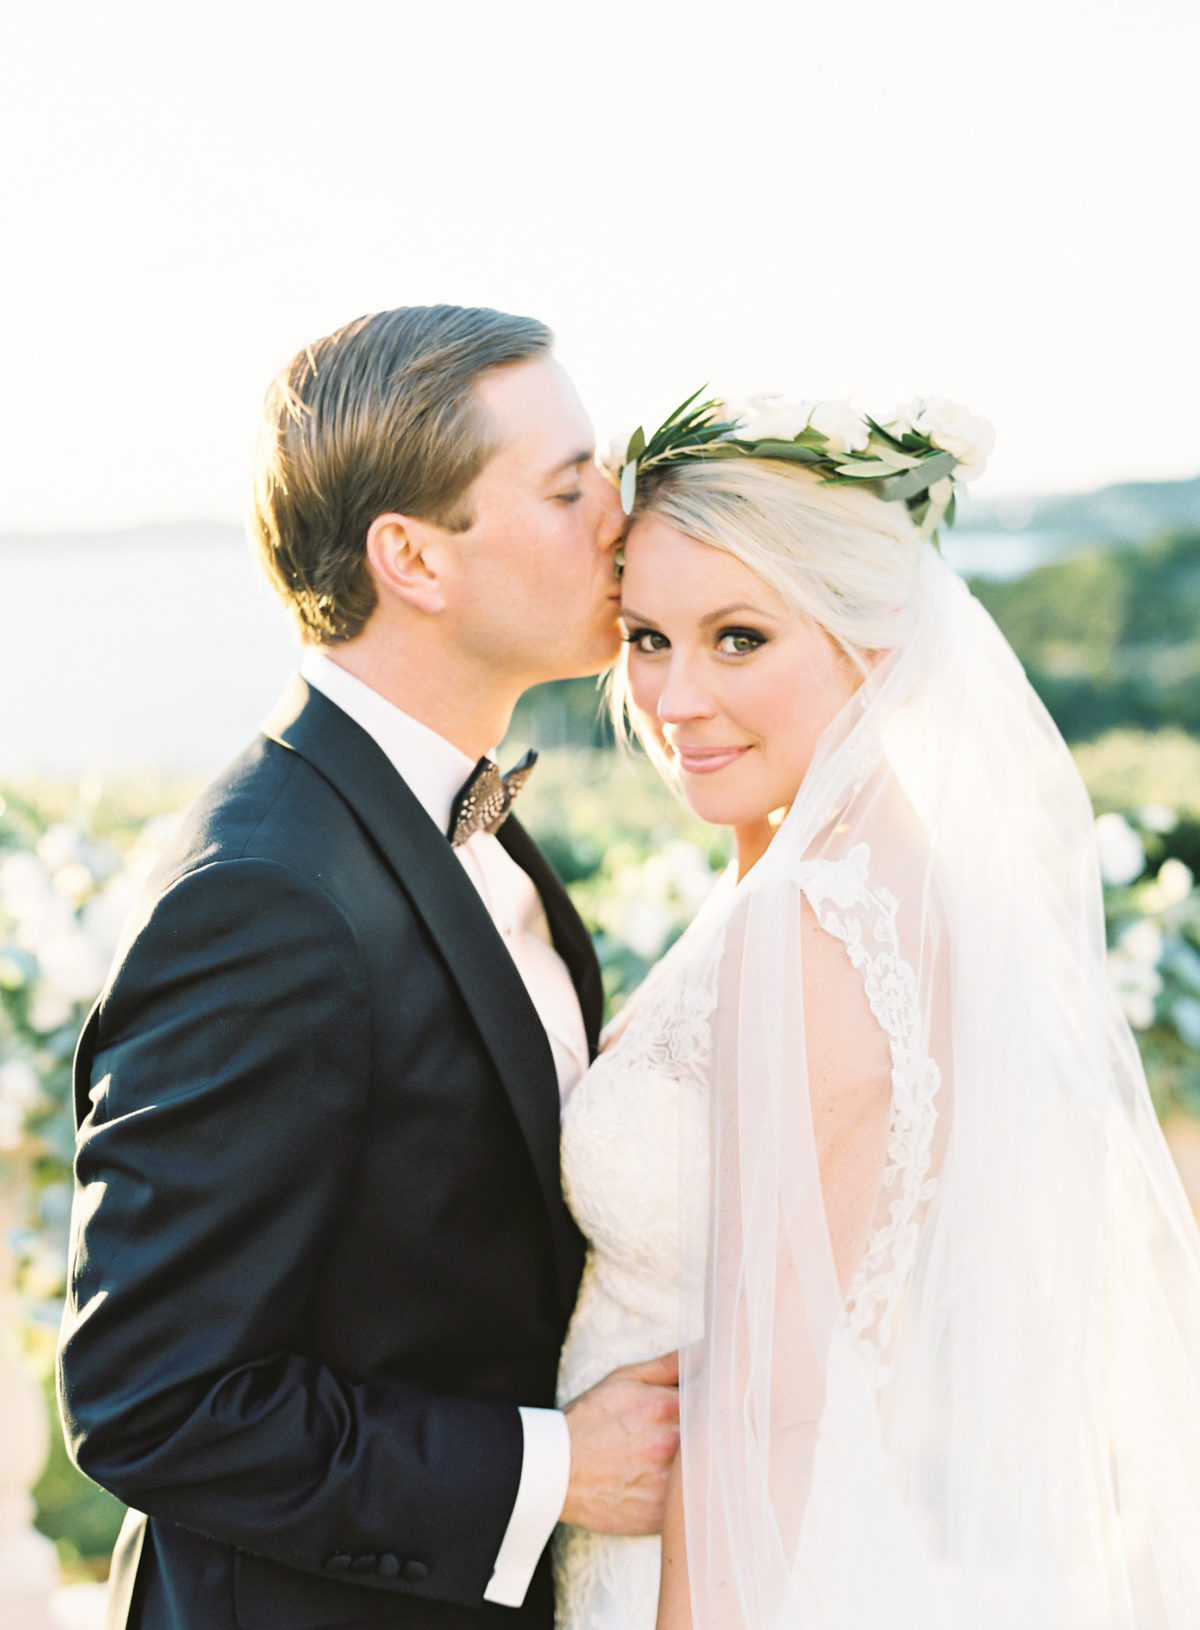 Emily's Wedding | Highlights